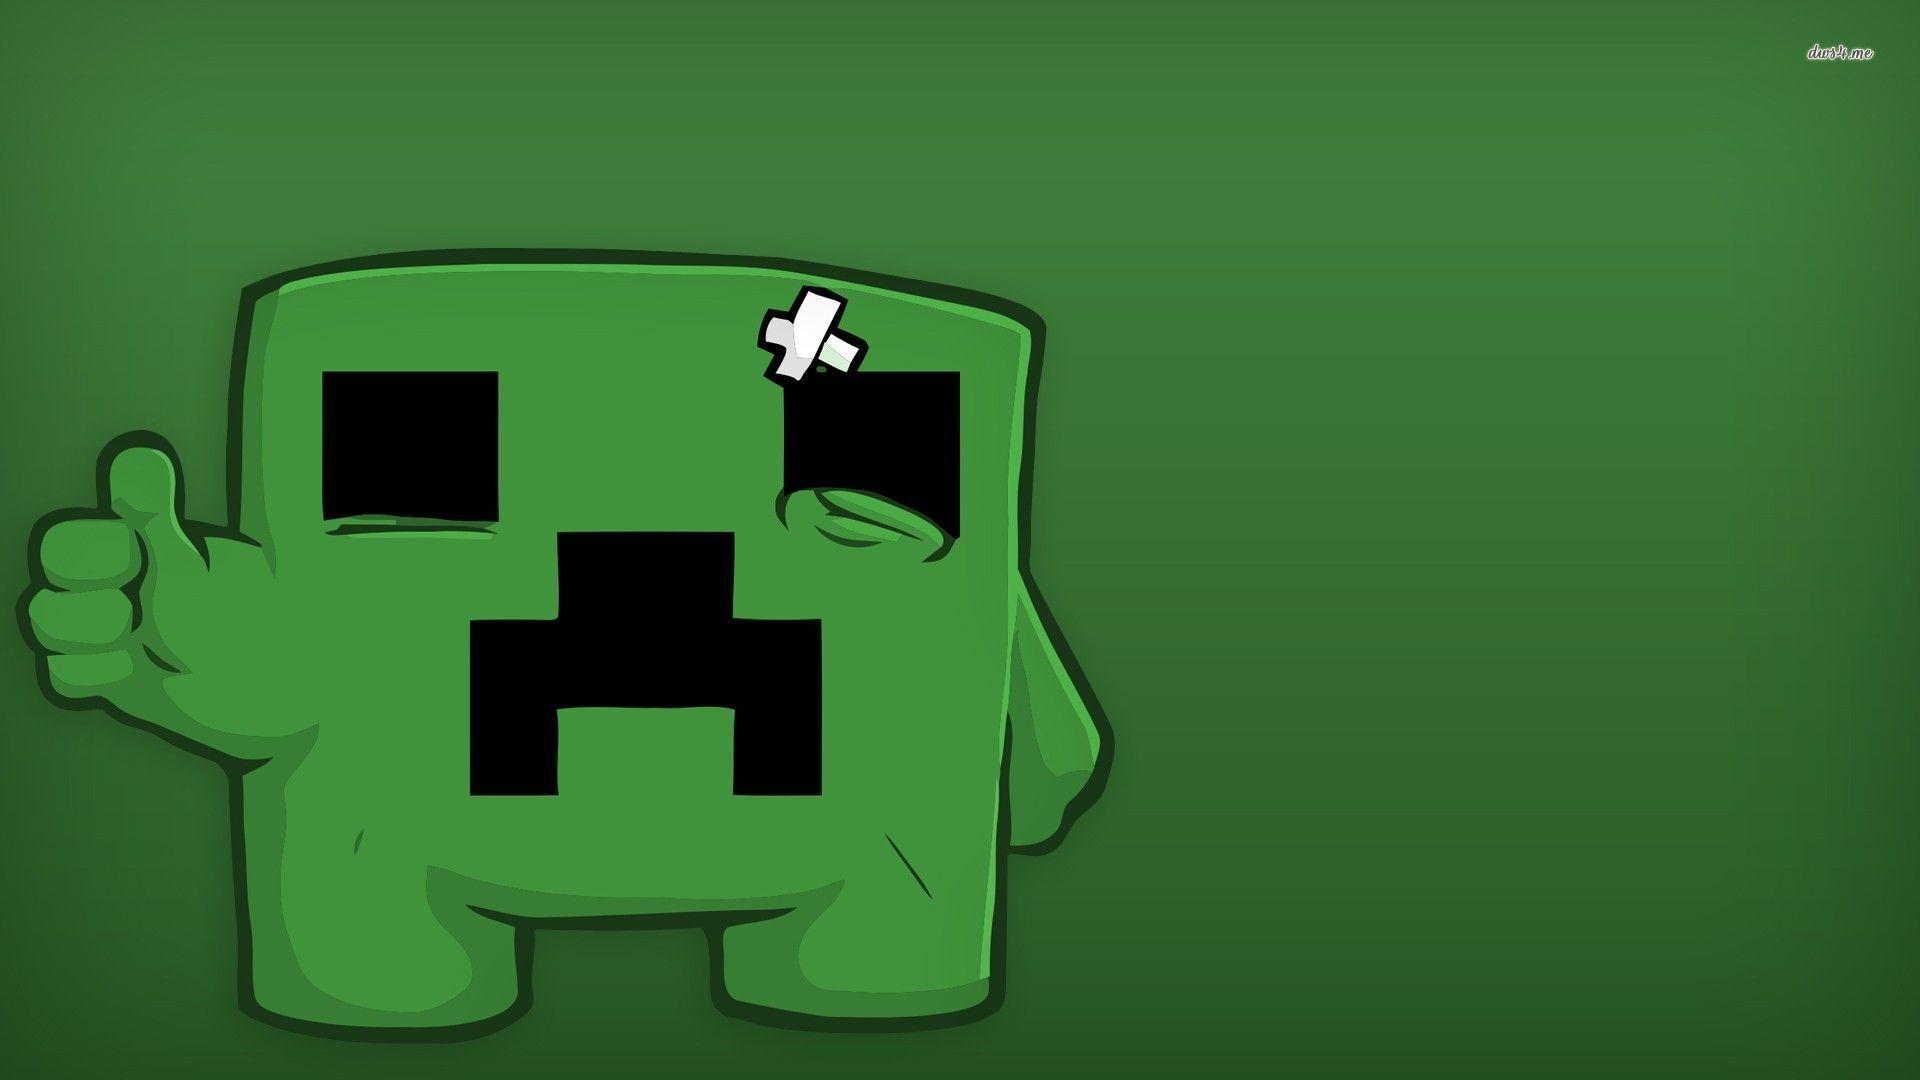 Super Meat Boy Wallpaper Minecraft 1140750 Hd